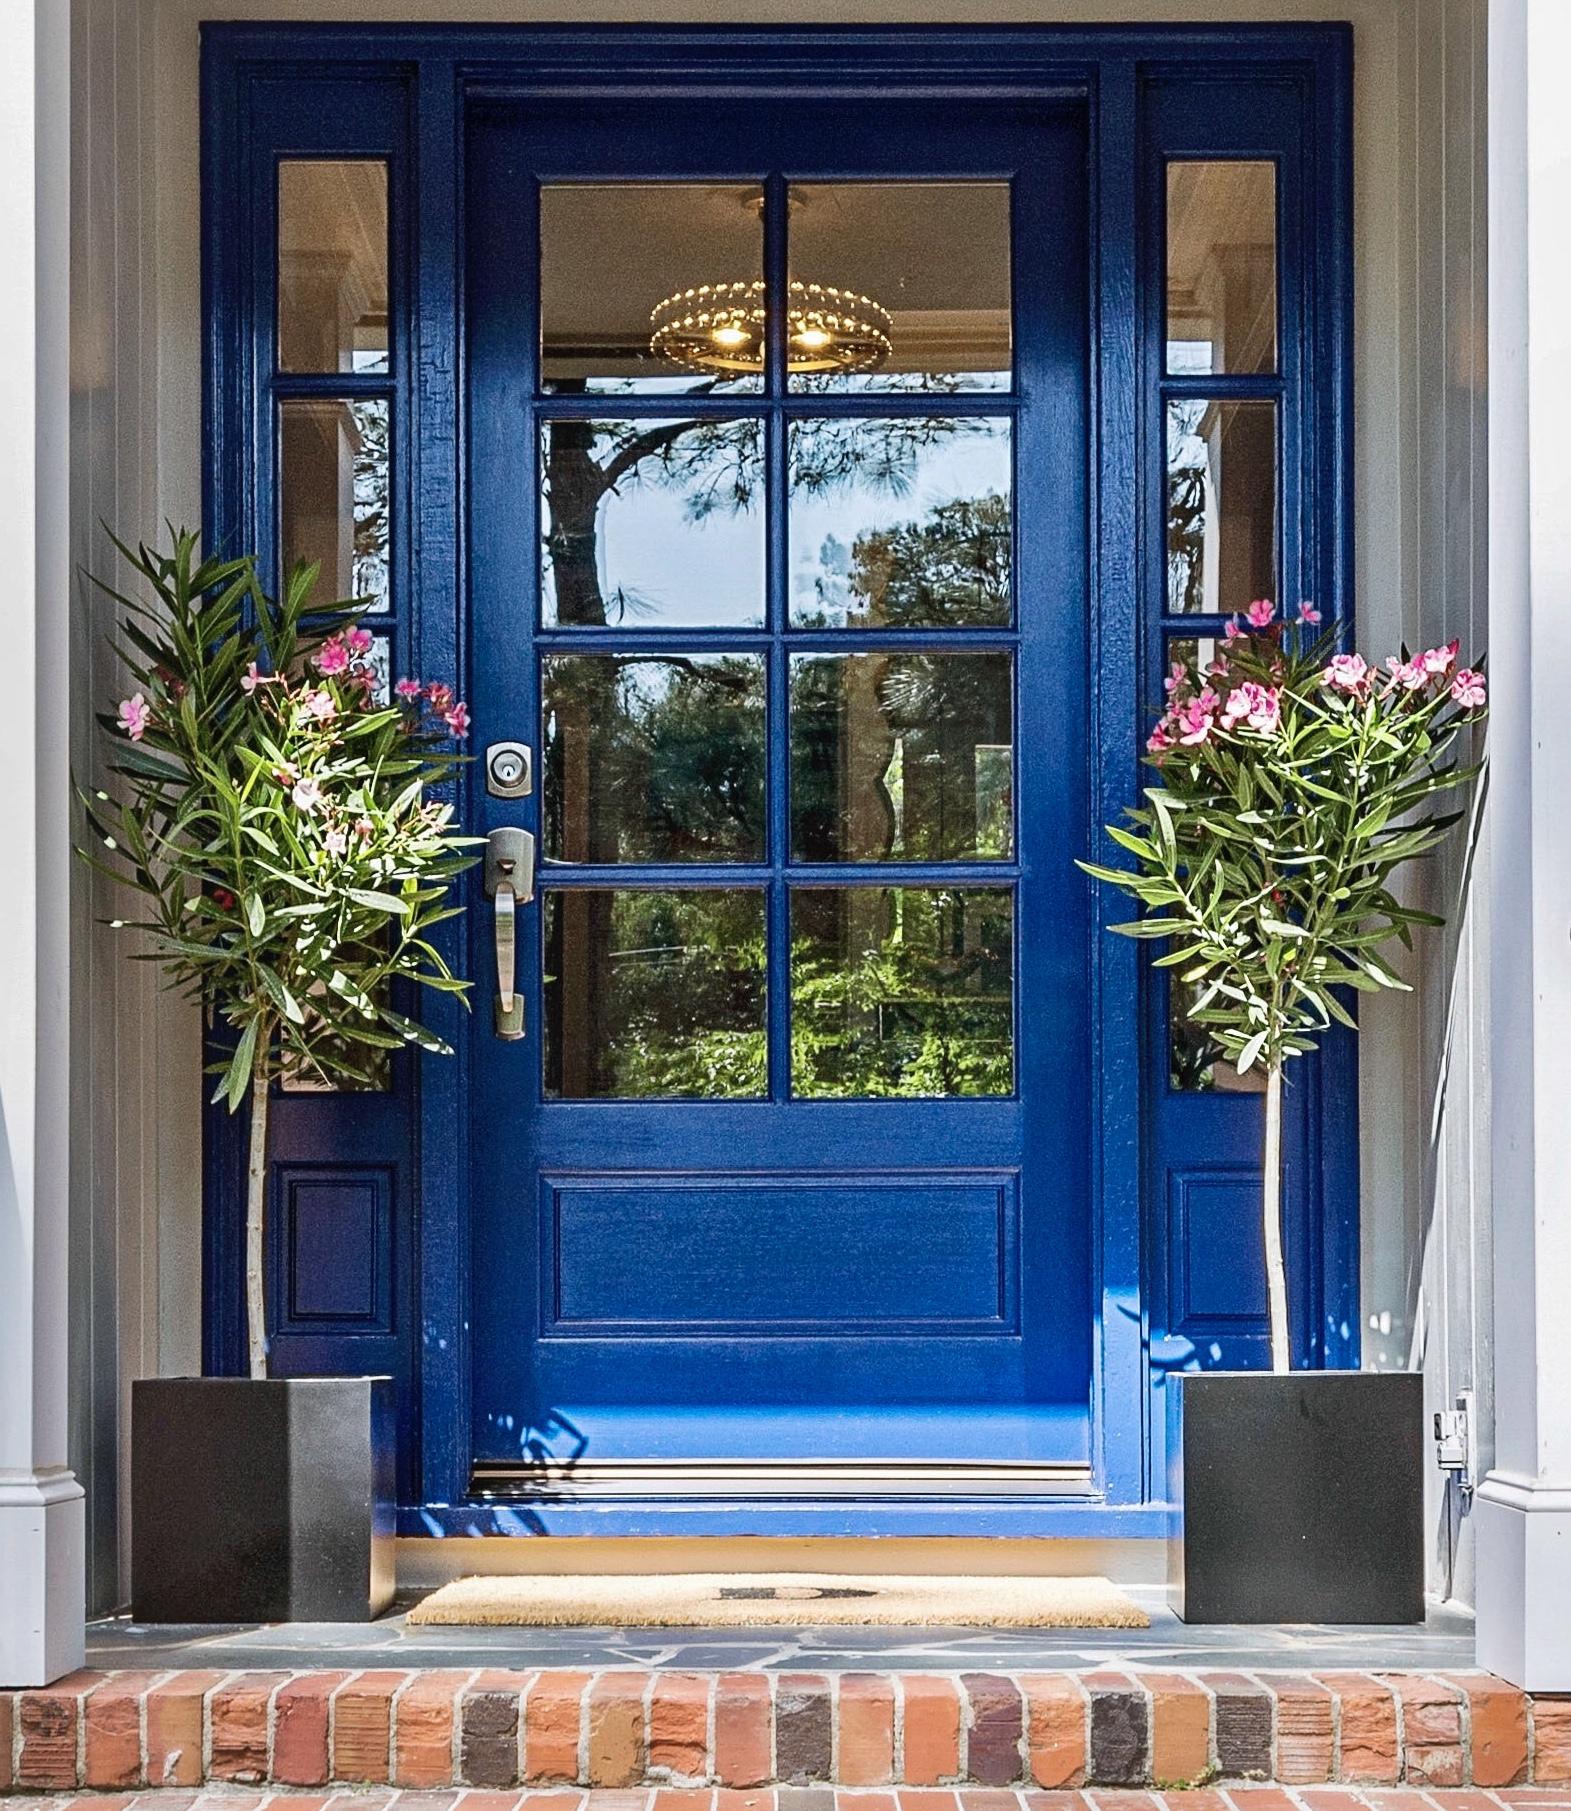 Best entryways One Room Challenge Jana Donohoe Designs Interior Designer Fayetteville, North Carolina